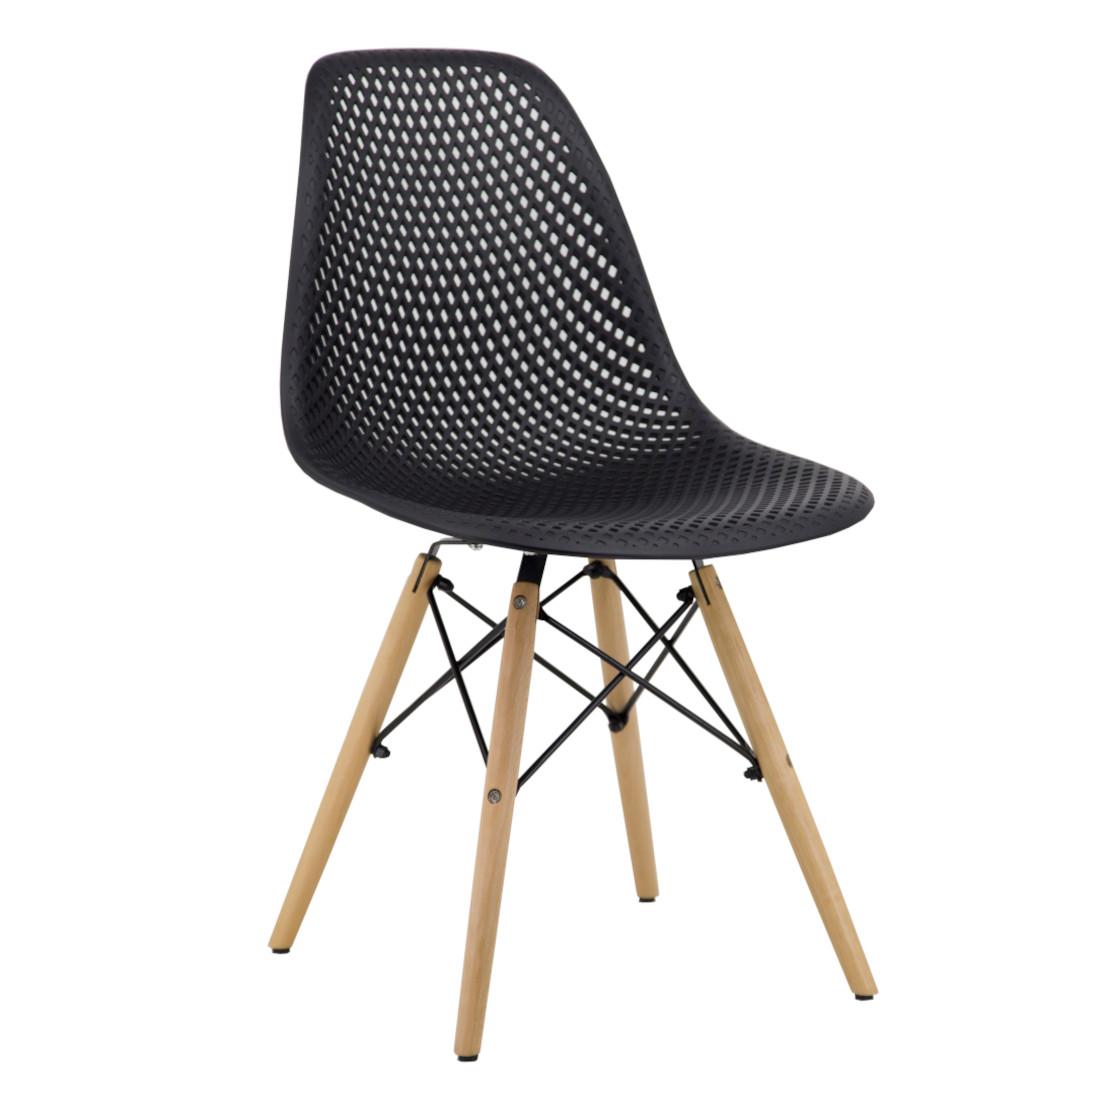 Cadeira Eloá Original Rivatti Releitura Charles Eames Eiffel